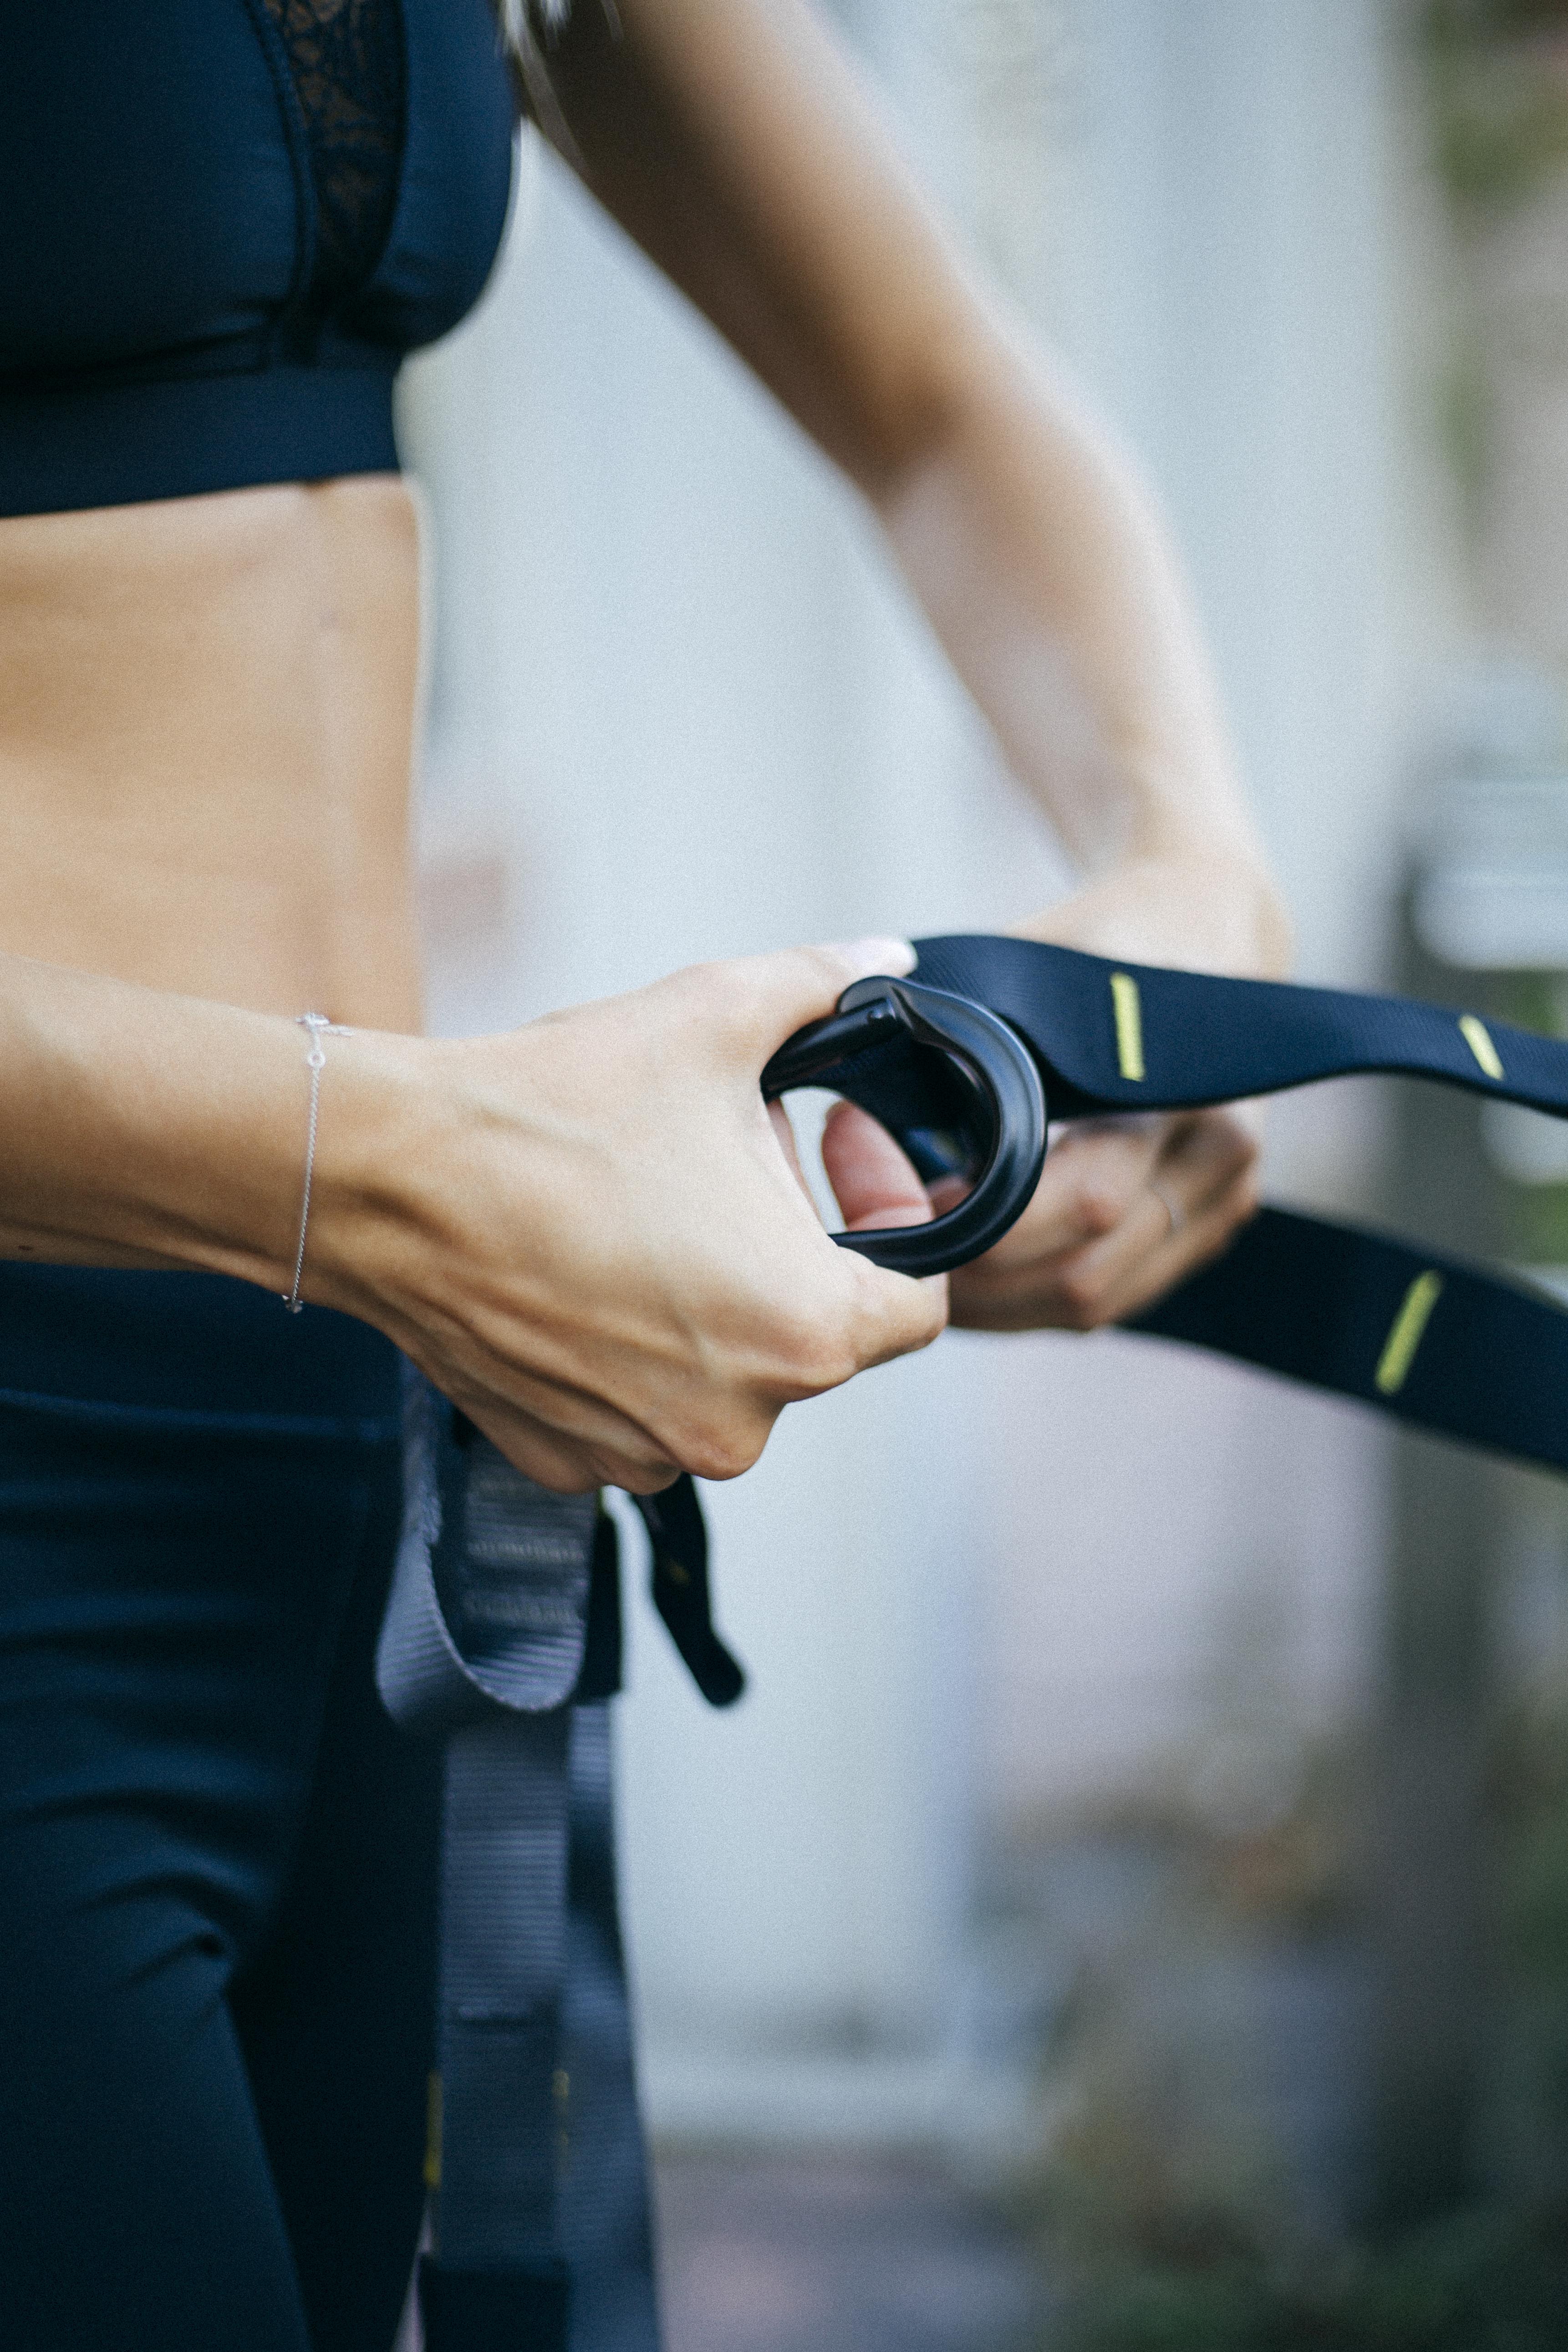 personaltraining_niederbayern_wallersdorf_zumba_fitnessbox_45SECONDS